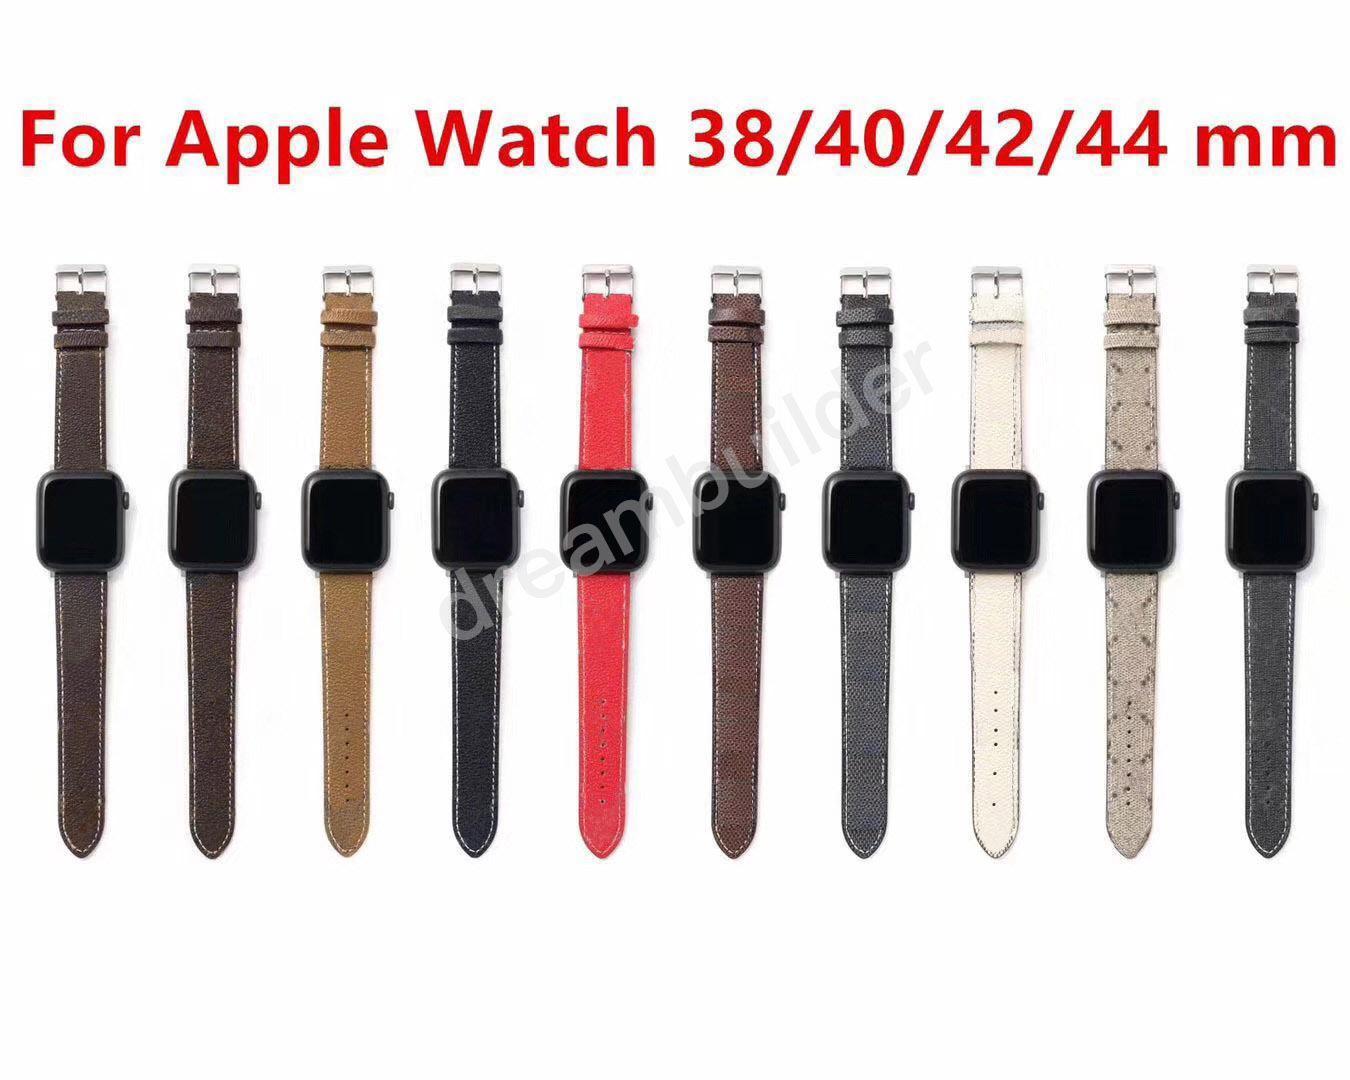 L مصمم الأزياء watchbands 42 ملليمتر 38 ملليمتر 40 ملليمتر 44 ملليمتر iwatch 2 3 4 5 العصابات الجلود حزام سوار المشارب watchband شحن مجاني